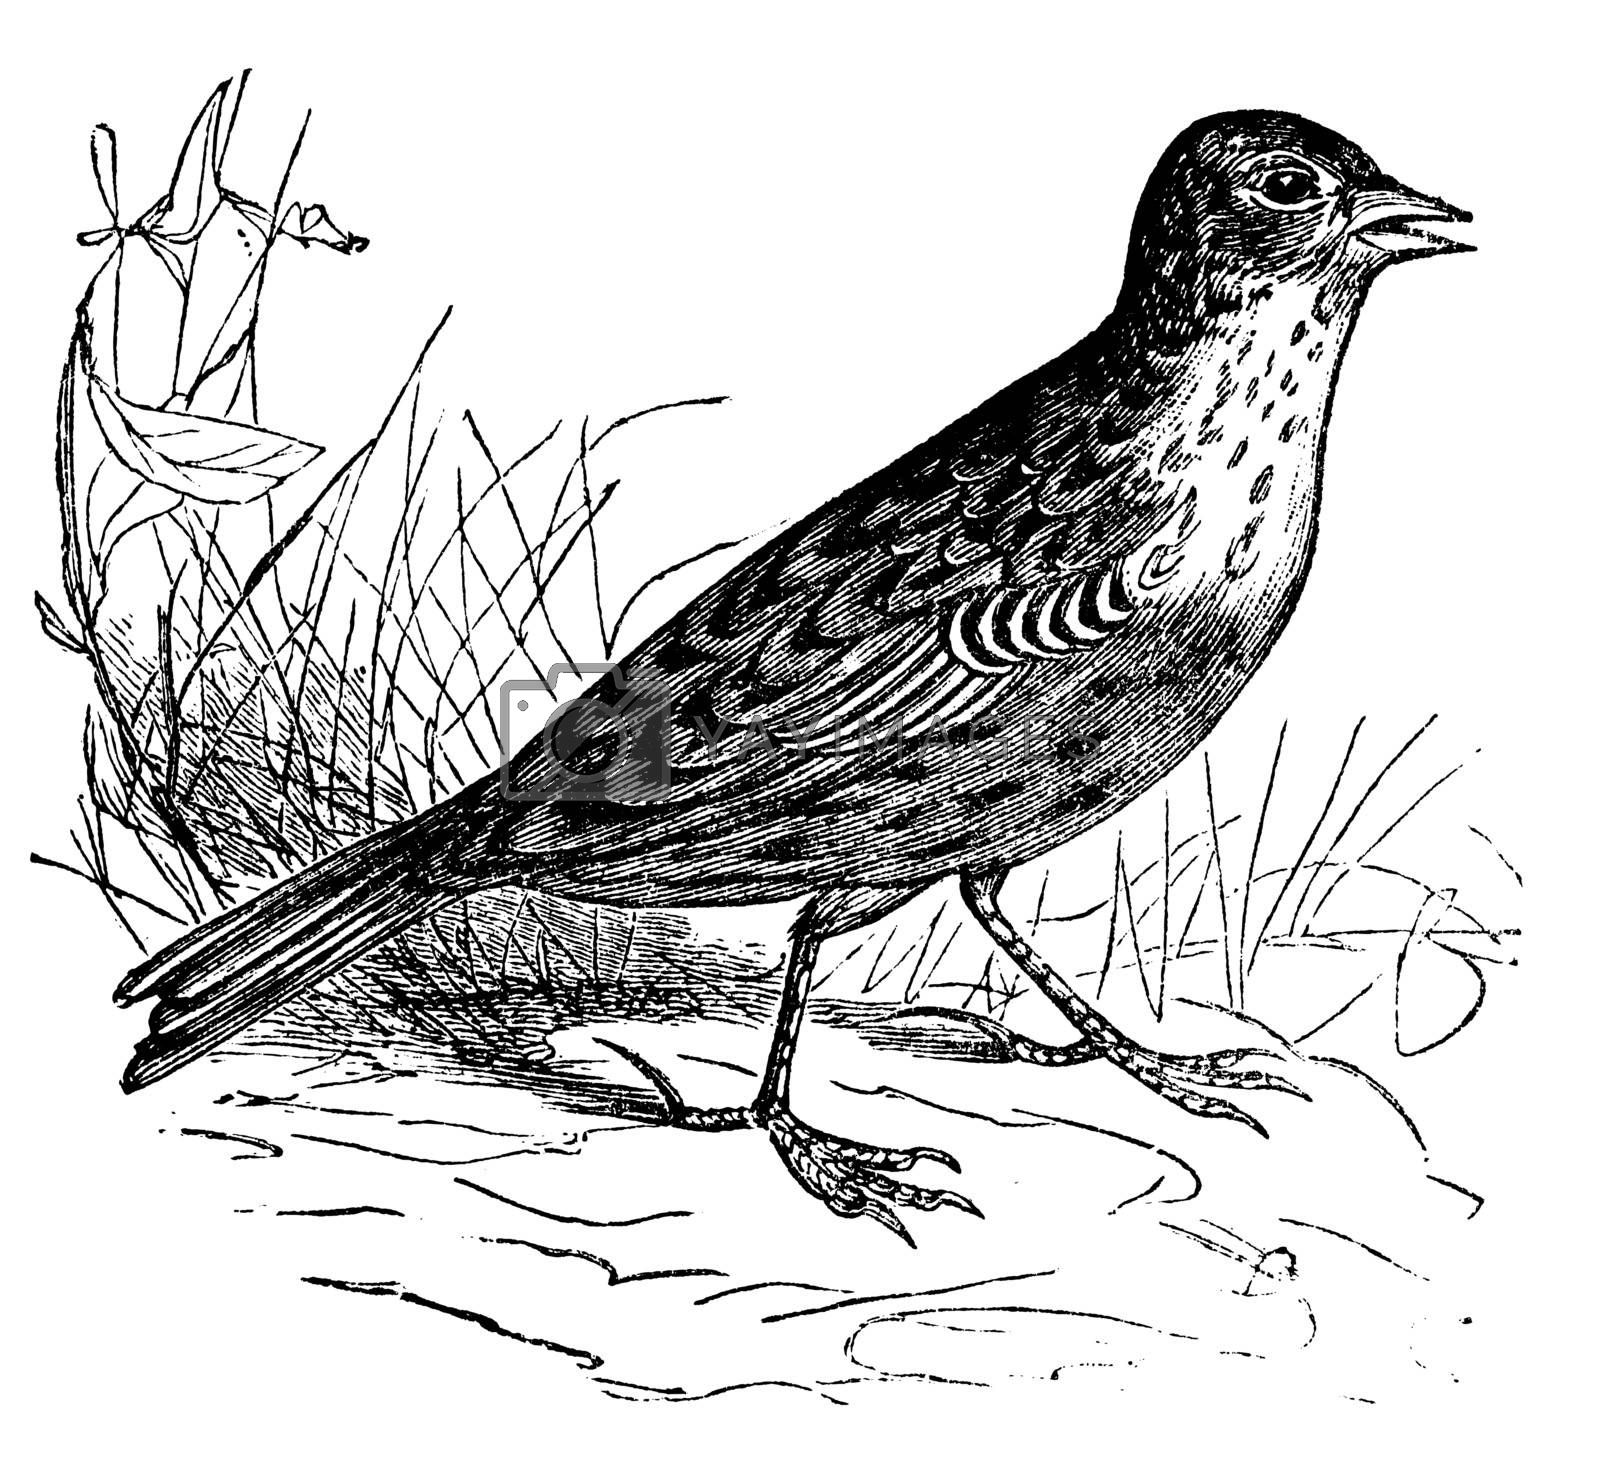 Skylark or Alauda arvensis vintage engraving. Old engraved illustration of a skylark bird in his environment.